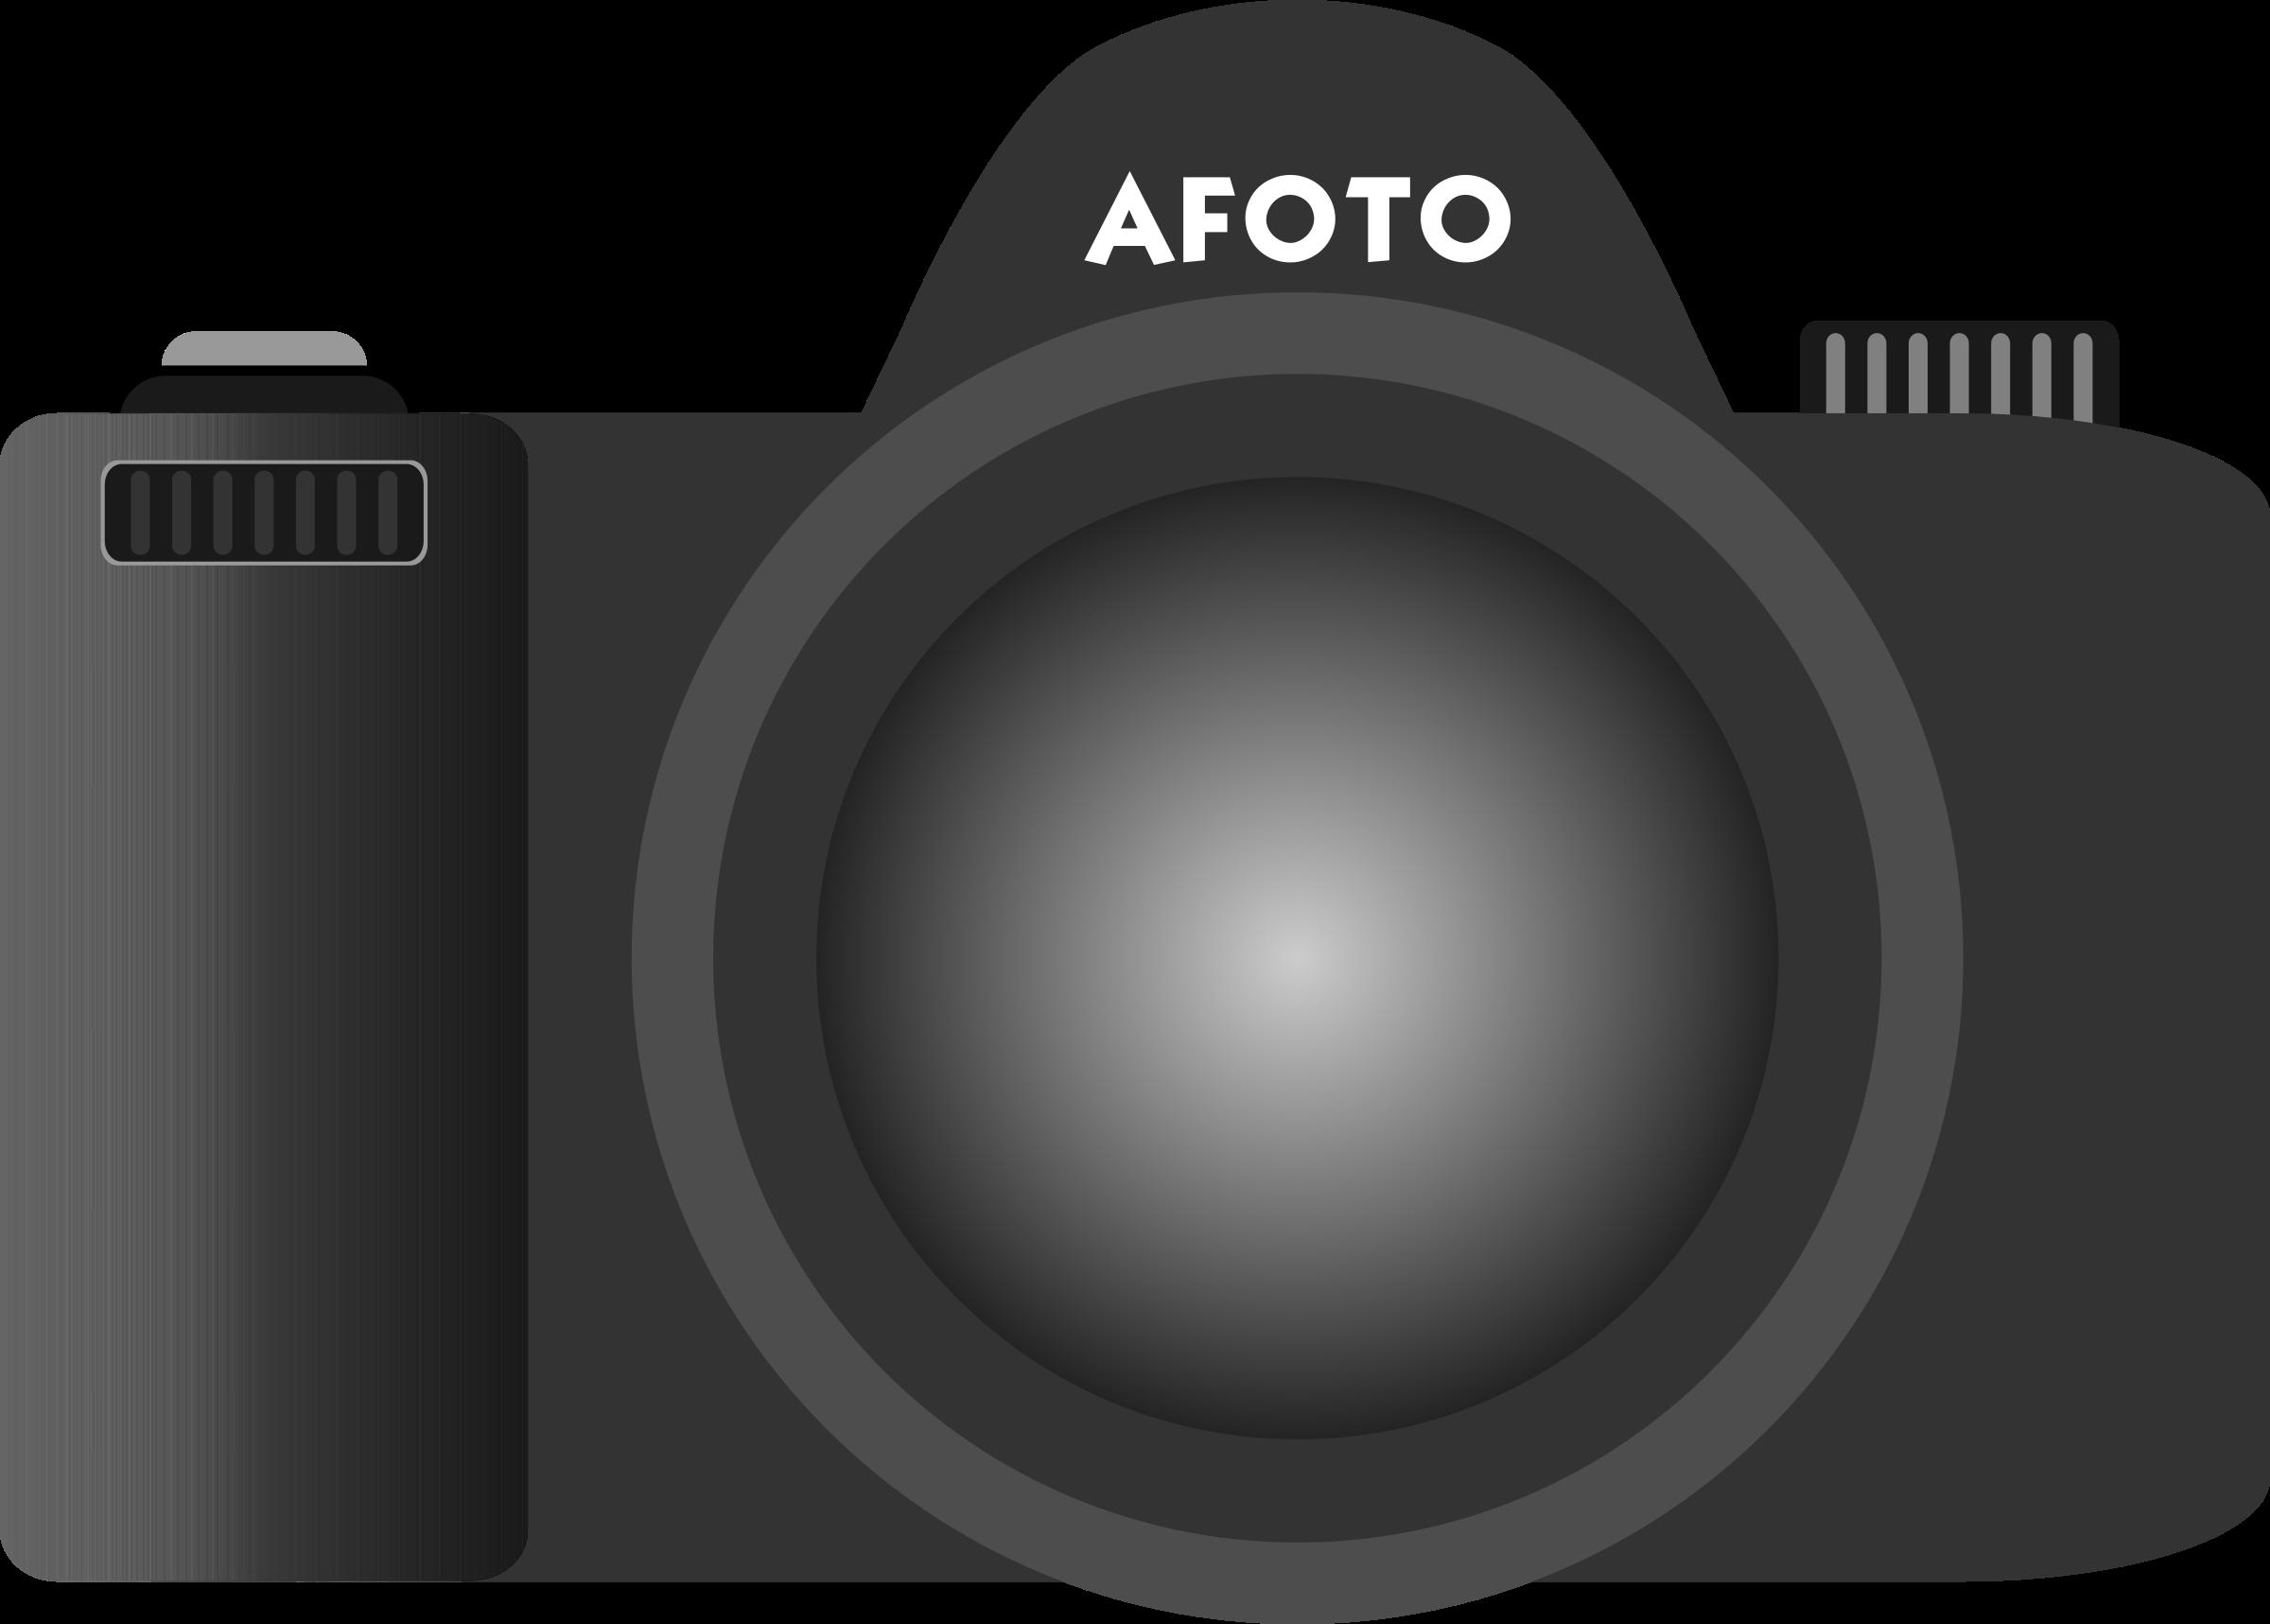 free clipart slr camera - photo #6